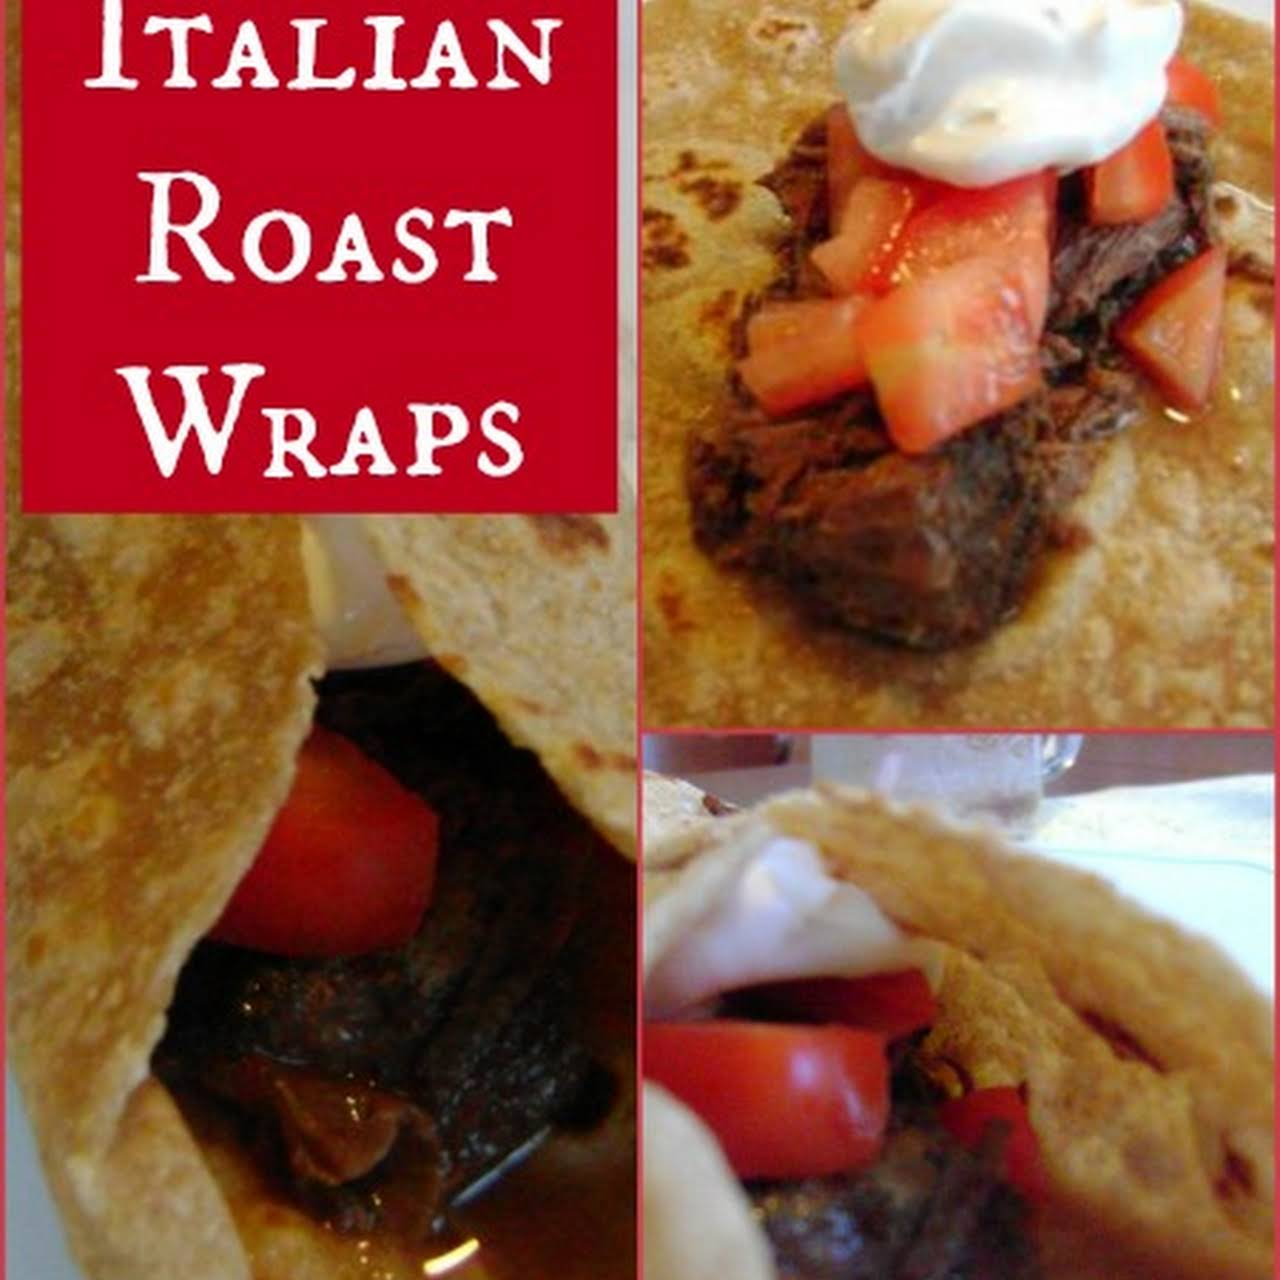 Italian Roast Wraps